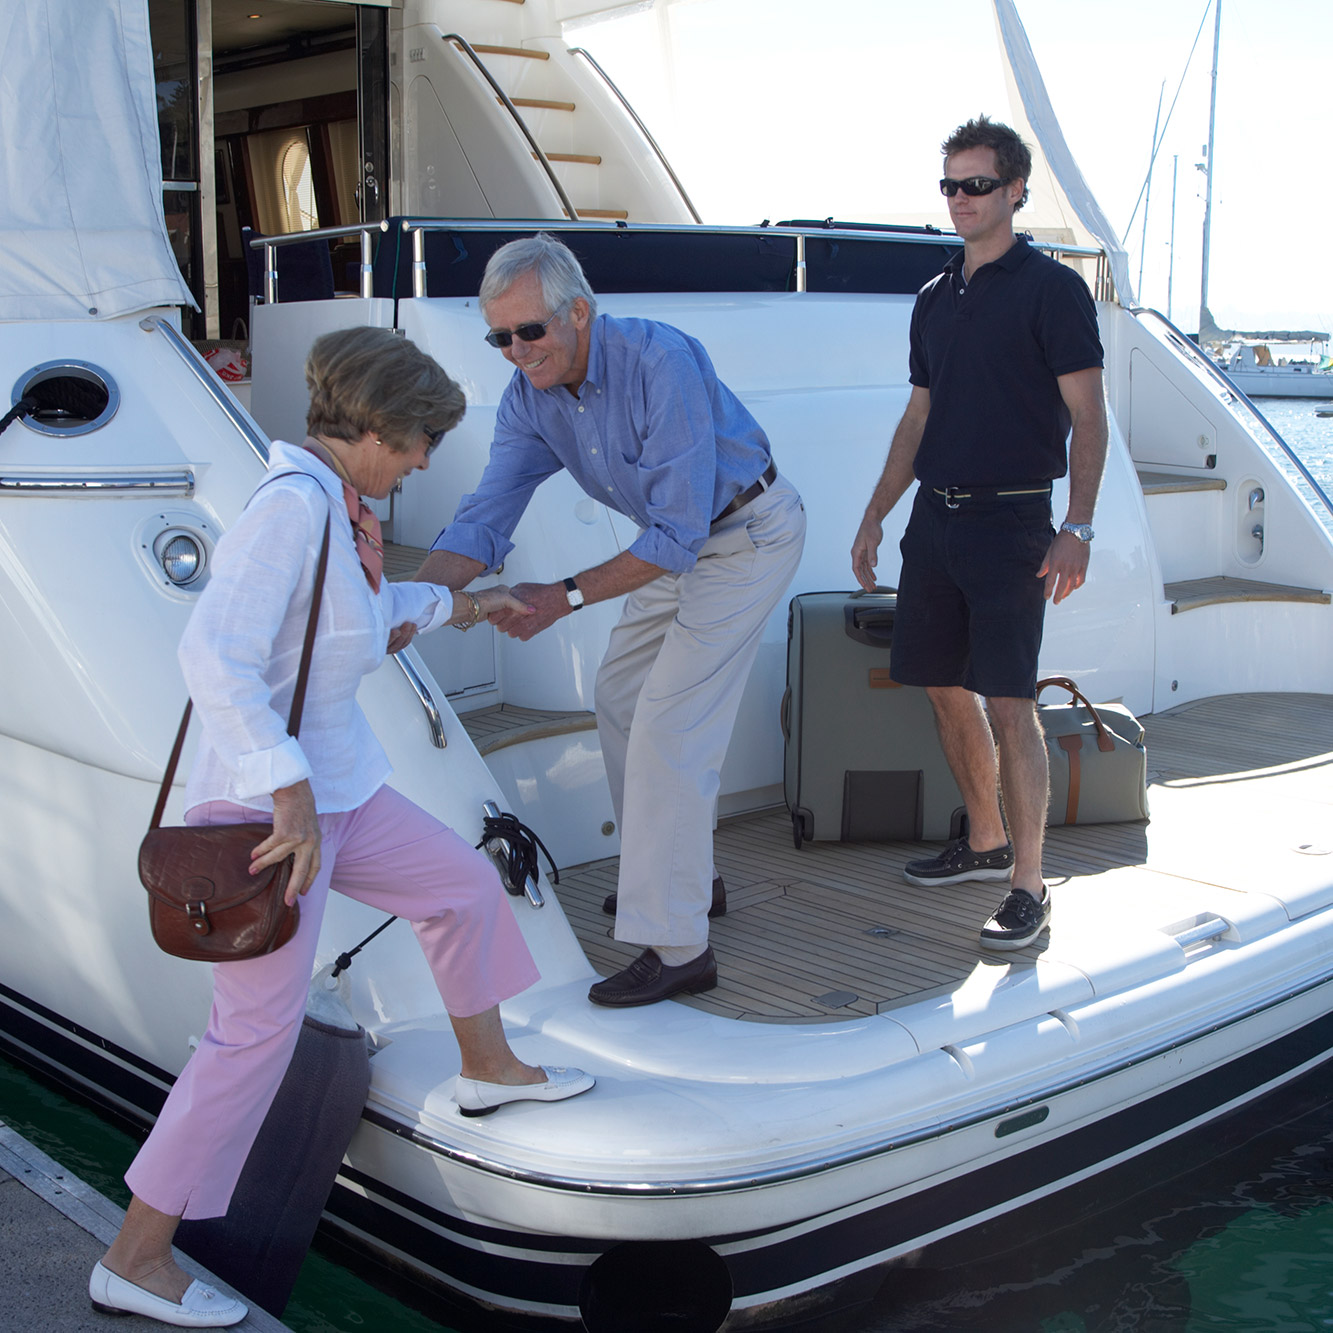 boatsmart-vessel-management-7-sq.jpg